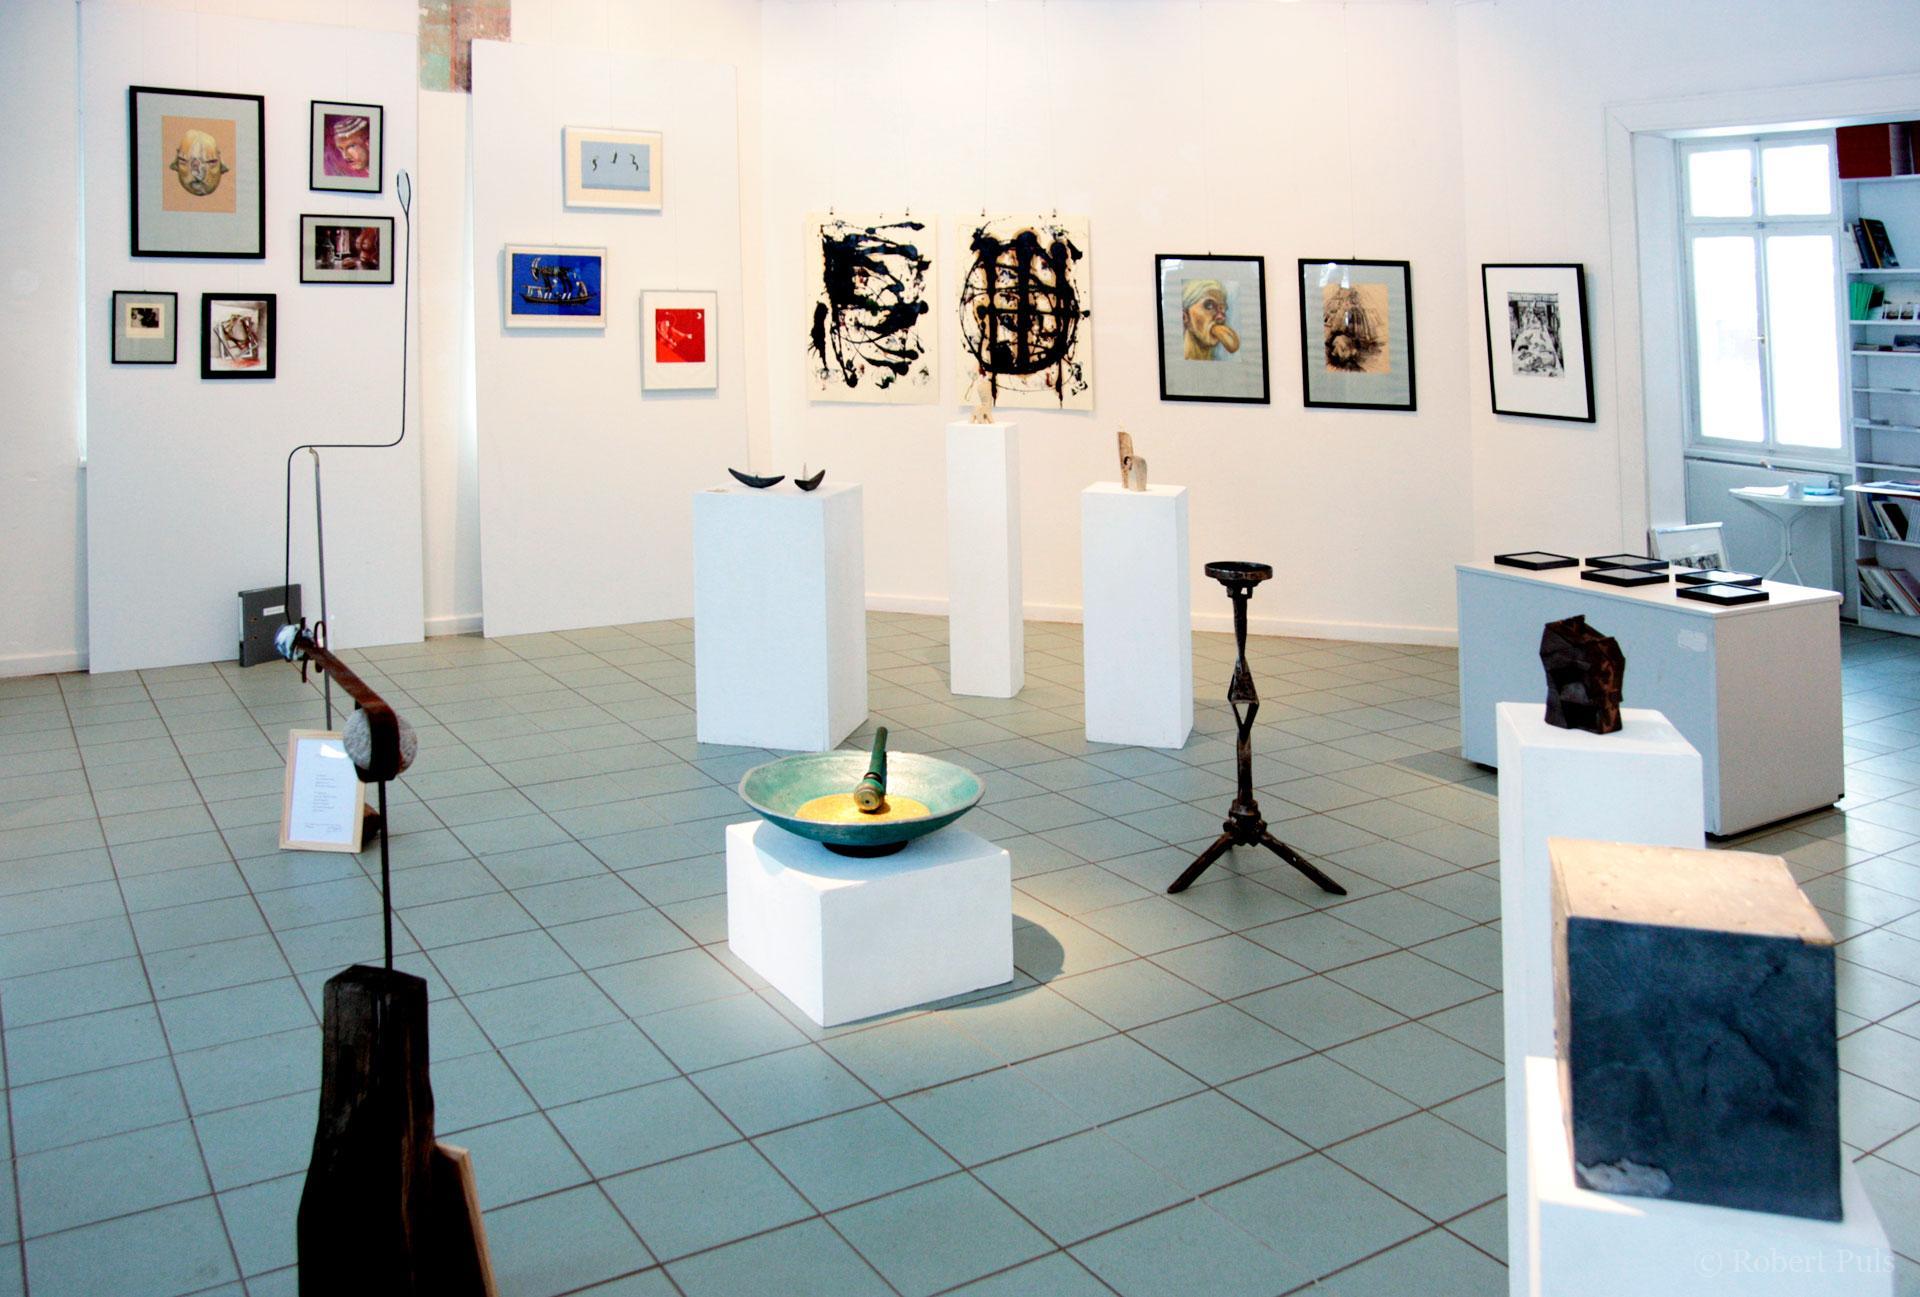 Ausstellung Heiligendamm FAK Bad Doberan Roter Pavillon